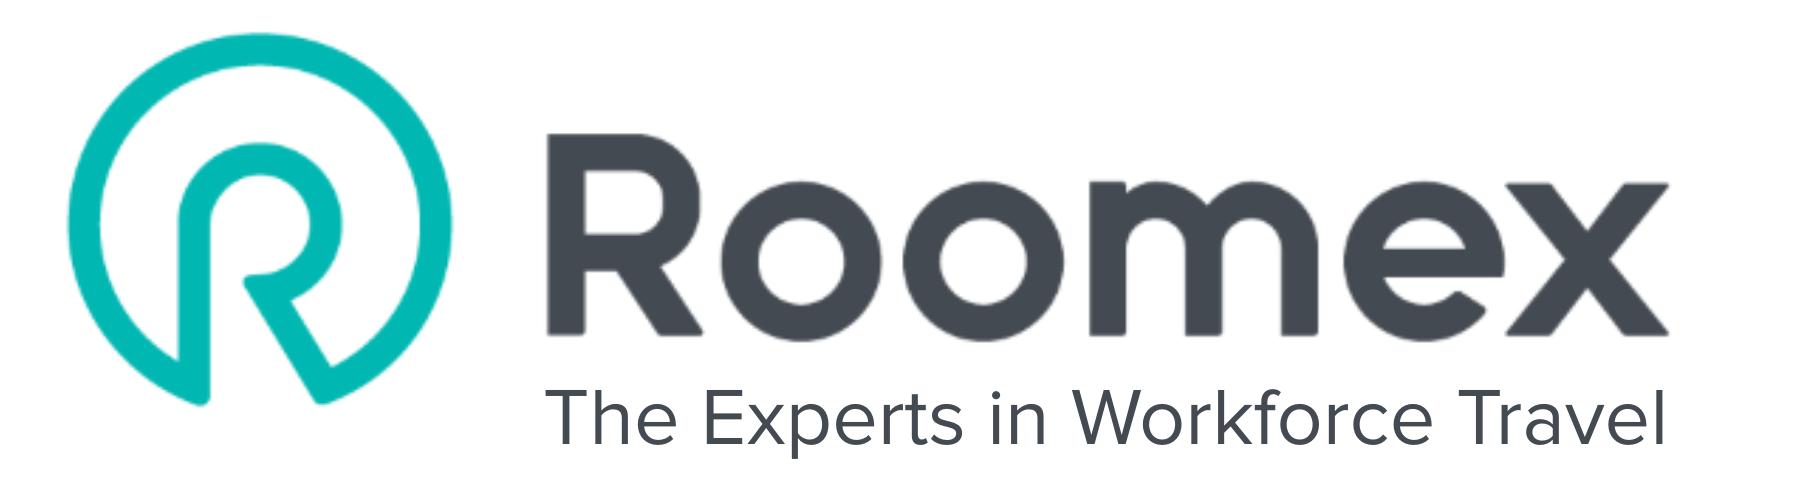 Roomex logo